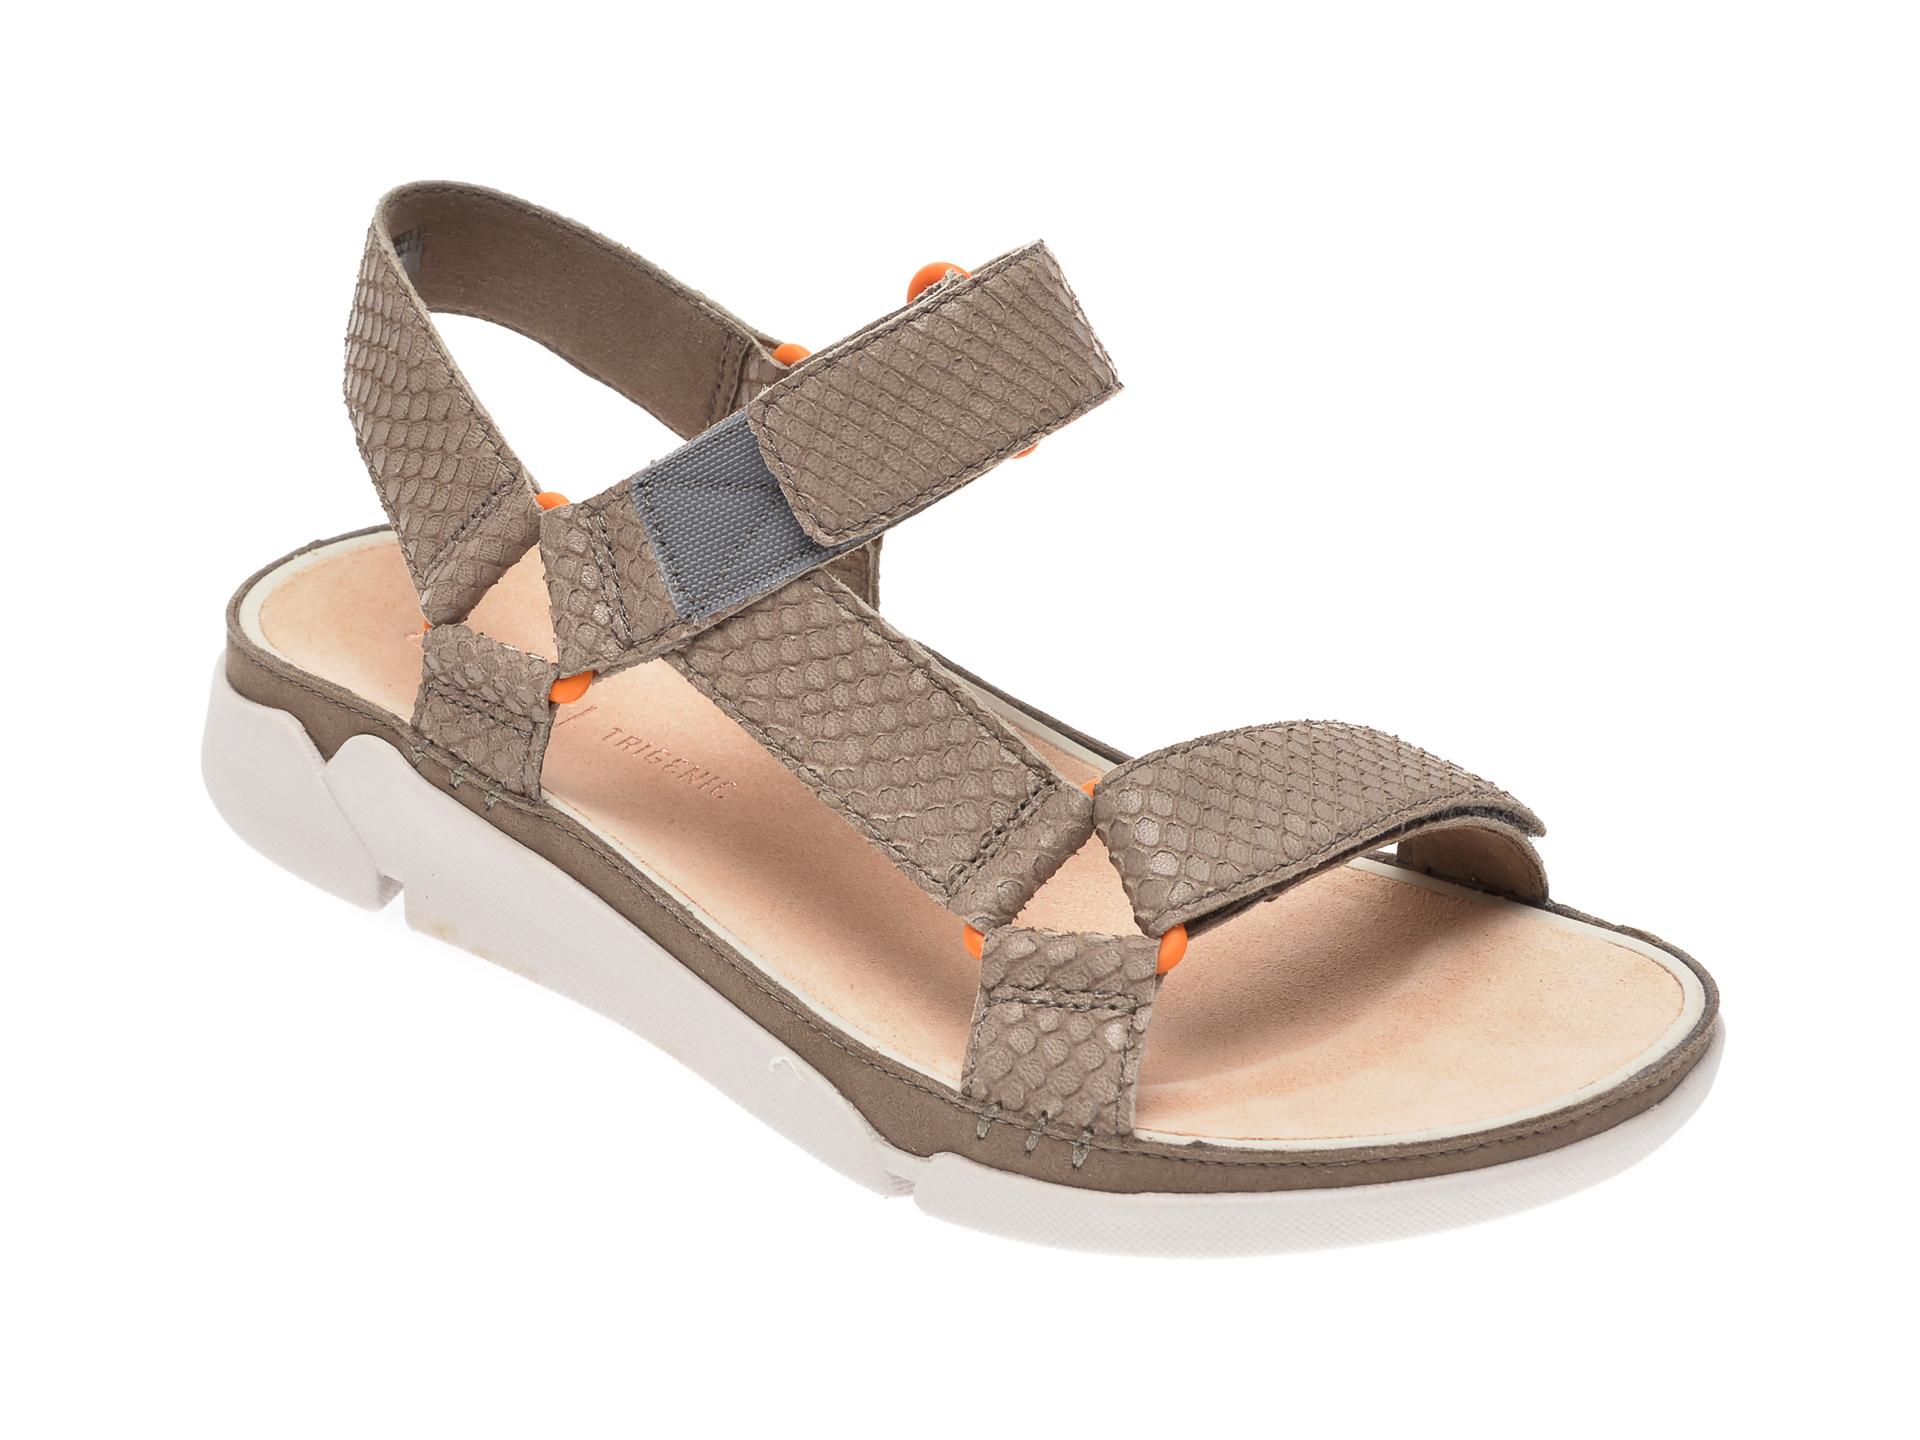 Sandale CLARKS nude, Lafley Lily, din piele naturala si material textil